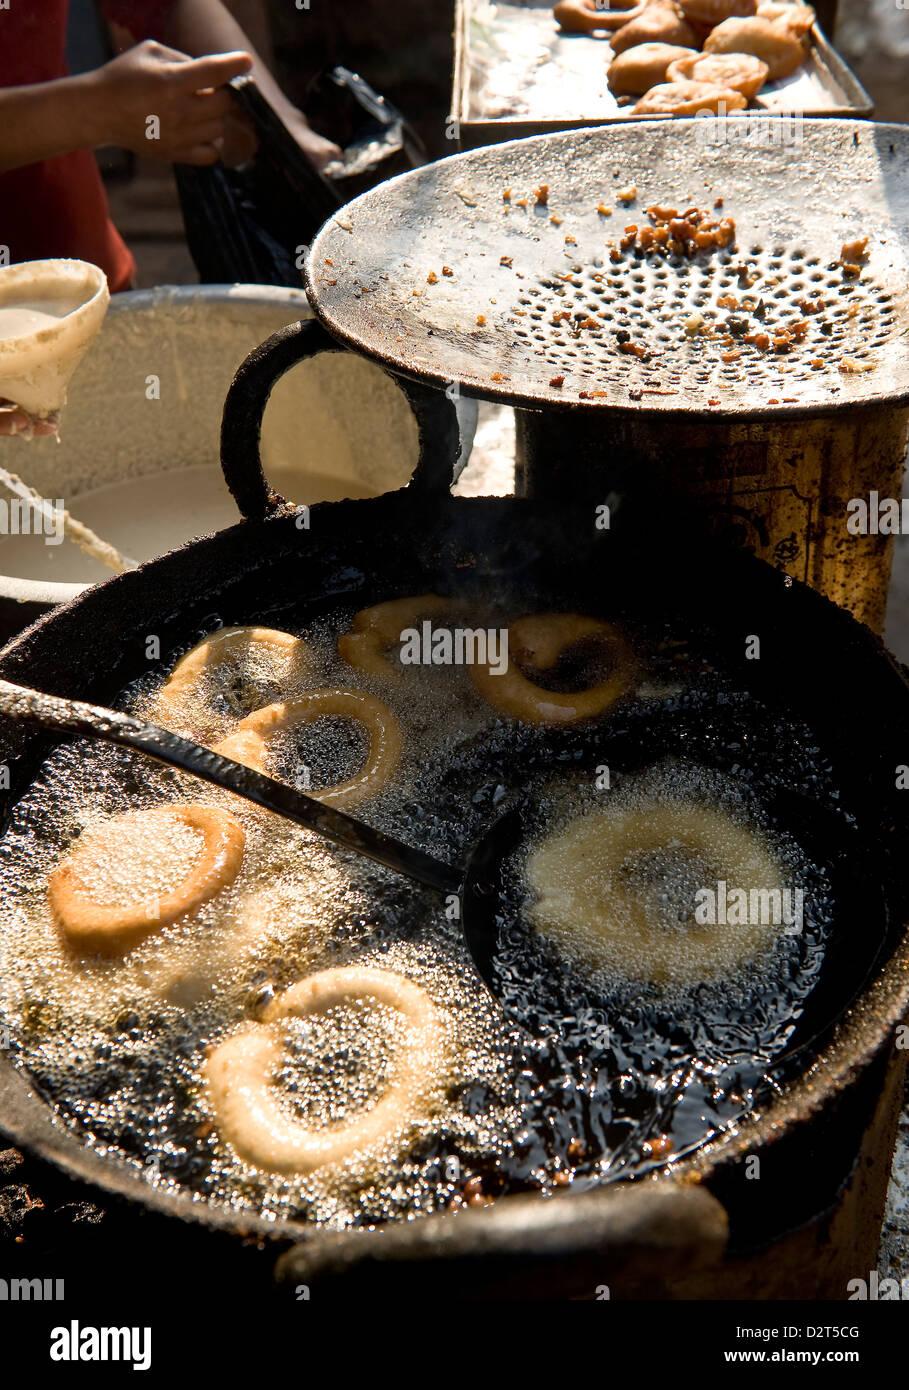 Fried food stall, Bhaktapur, Nepal, Asia - Stock Image